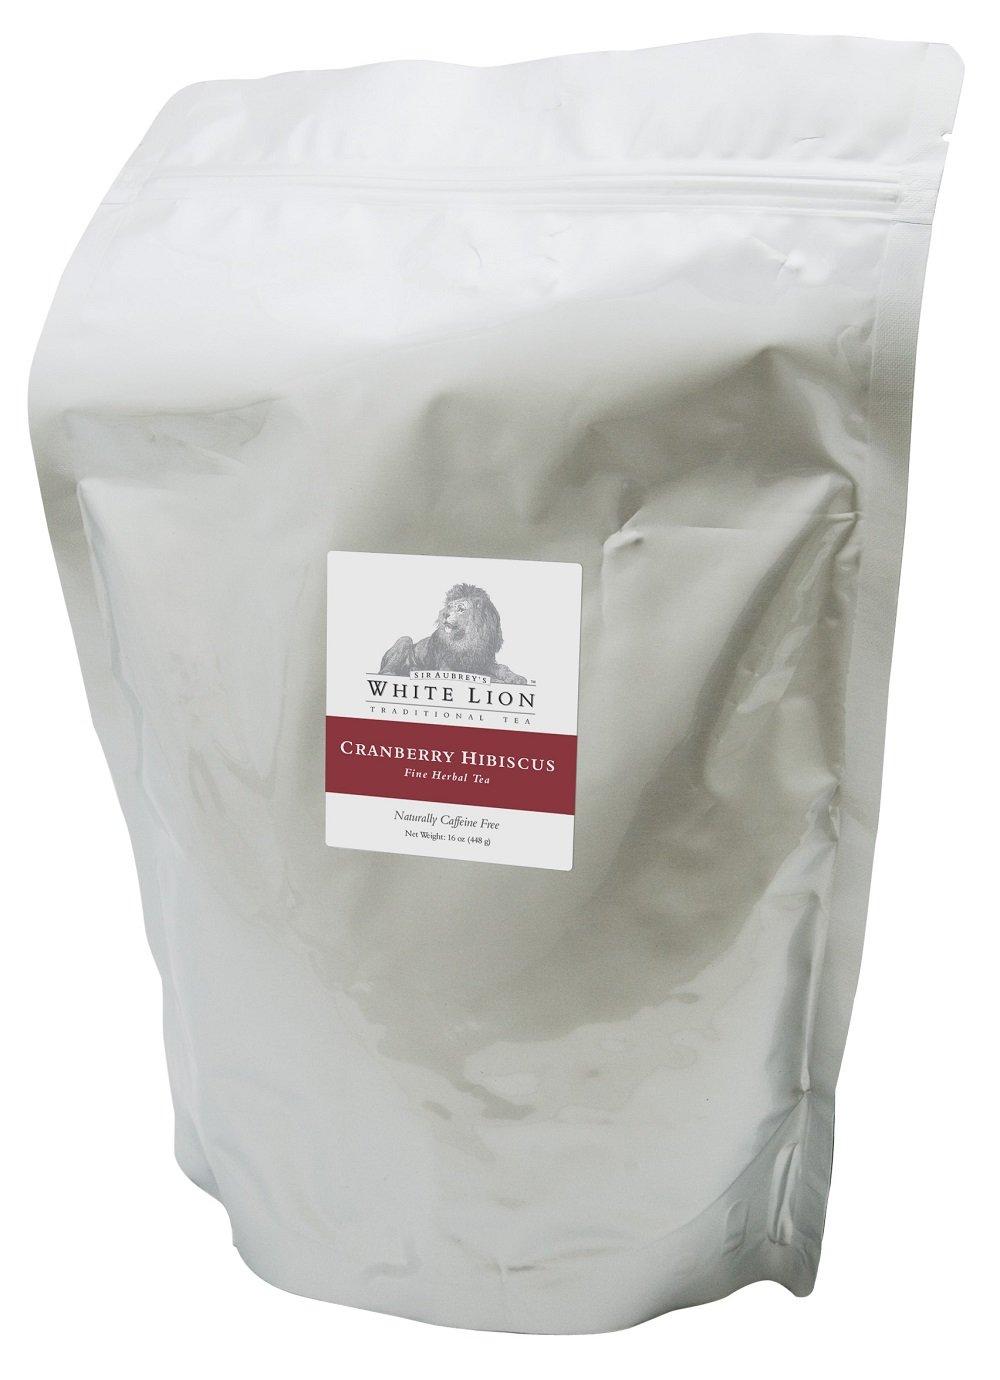 White Lion Cranberry Hibiscus Loose Tea, 16 oz